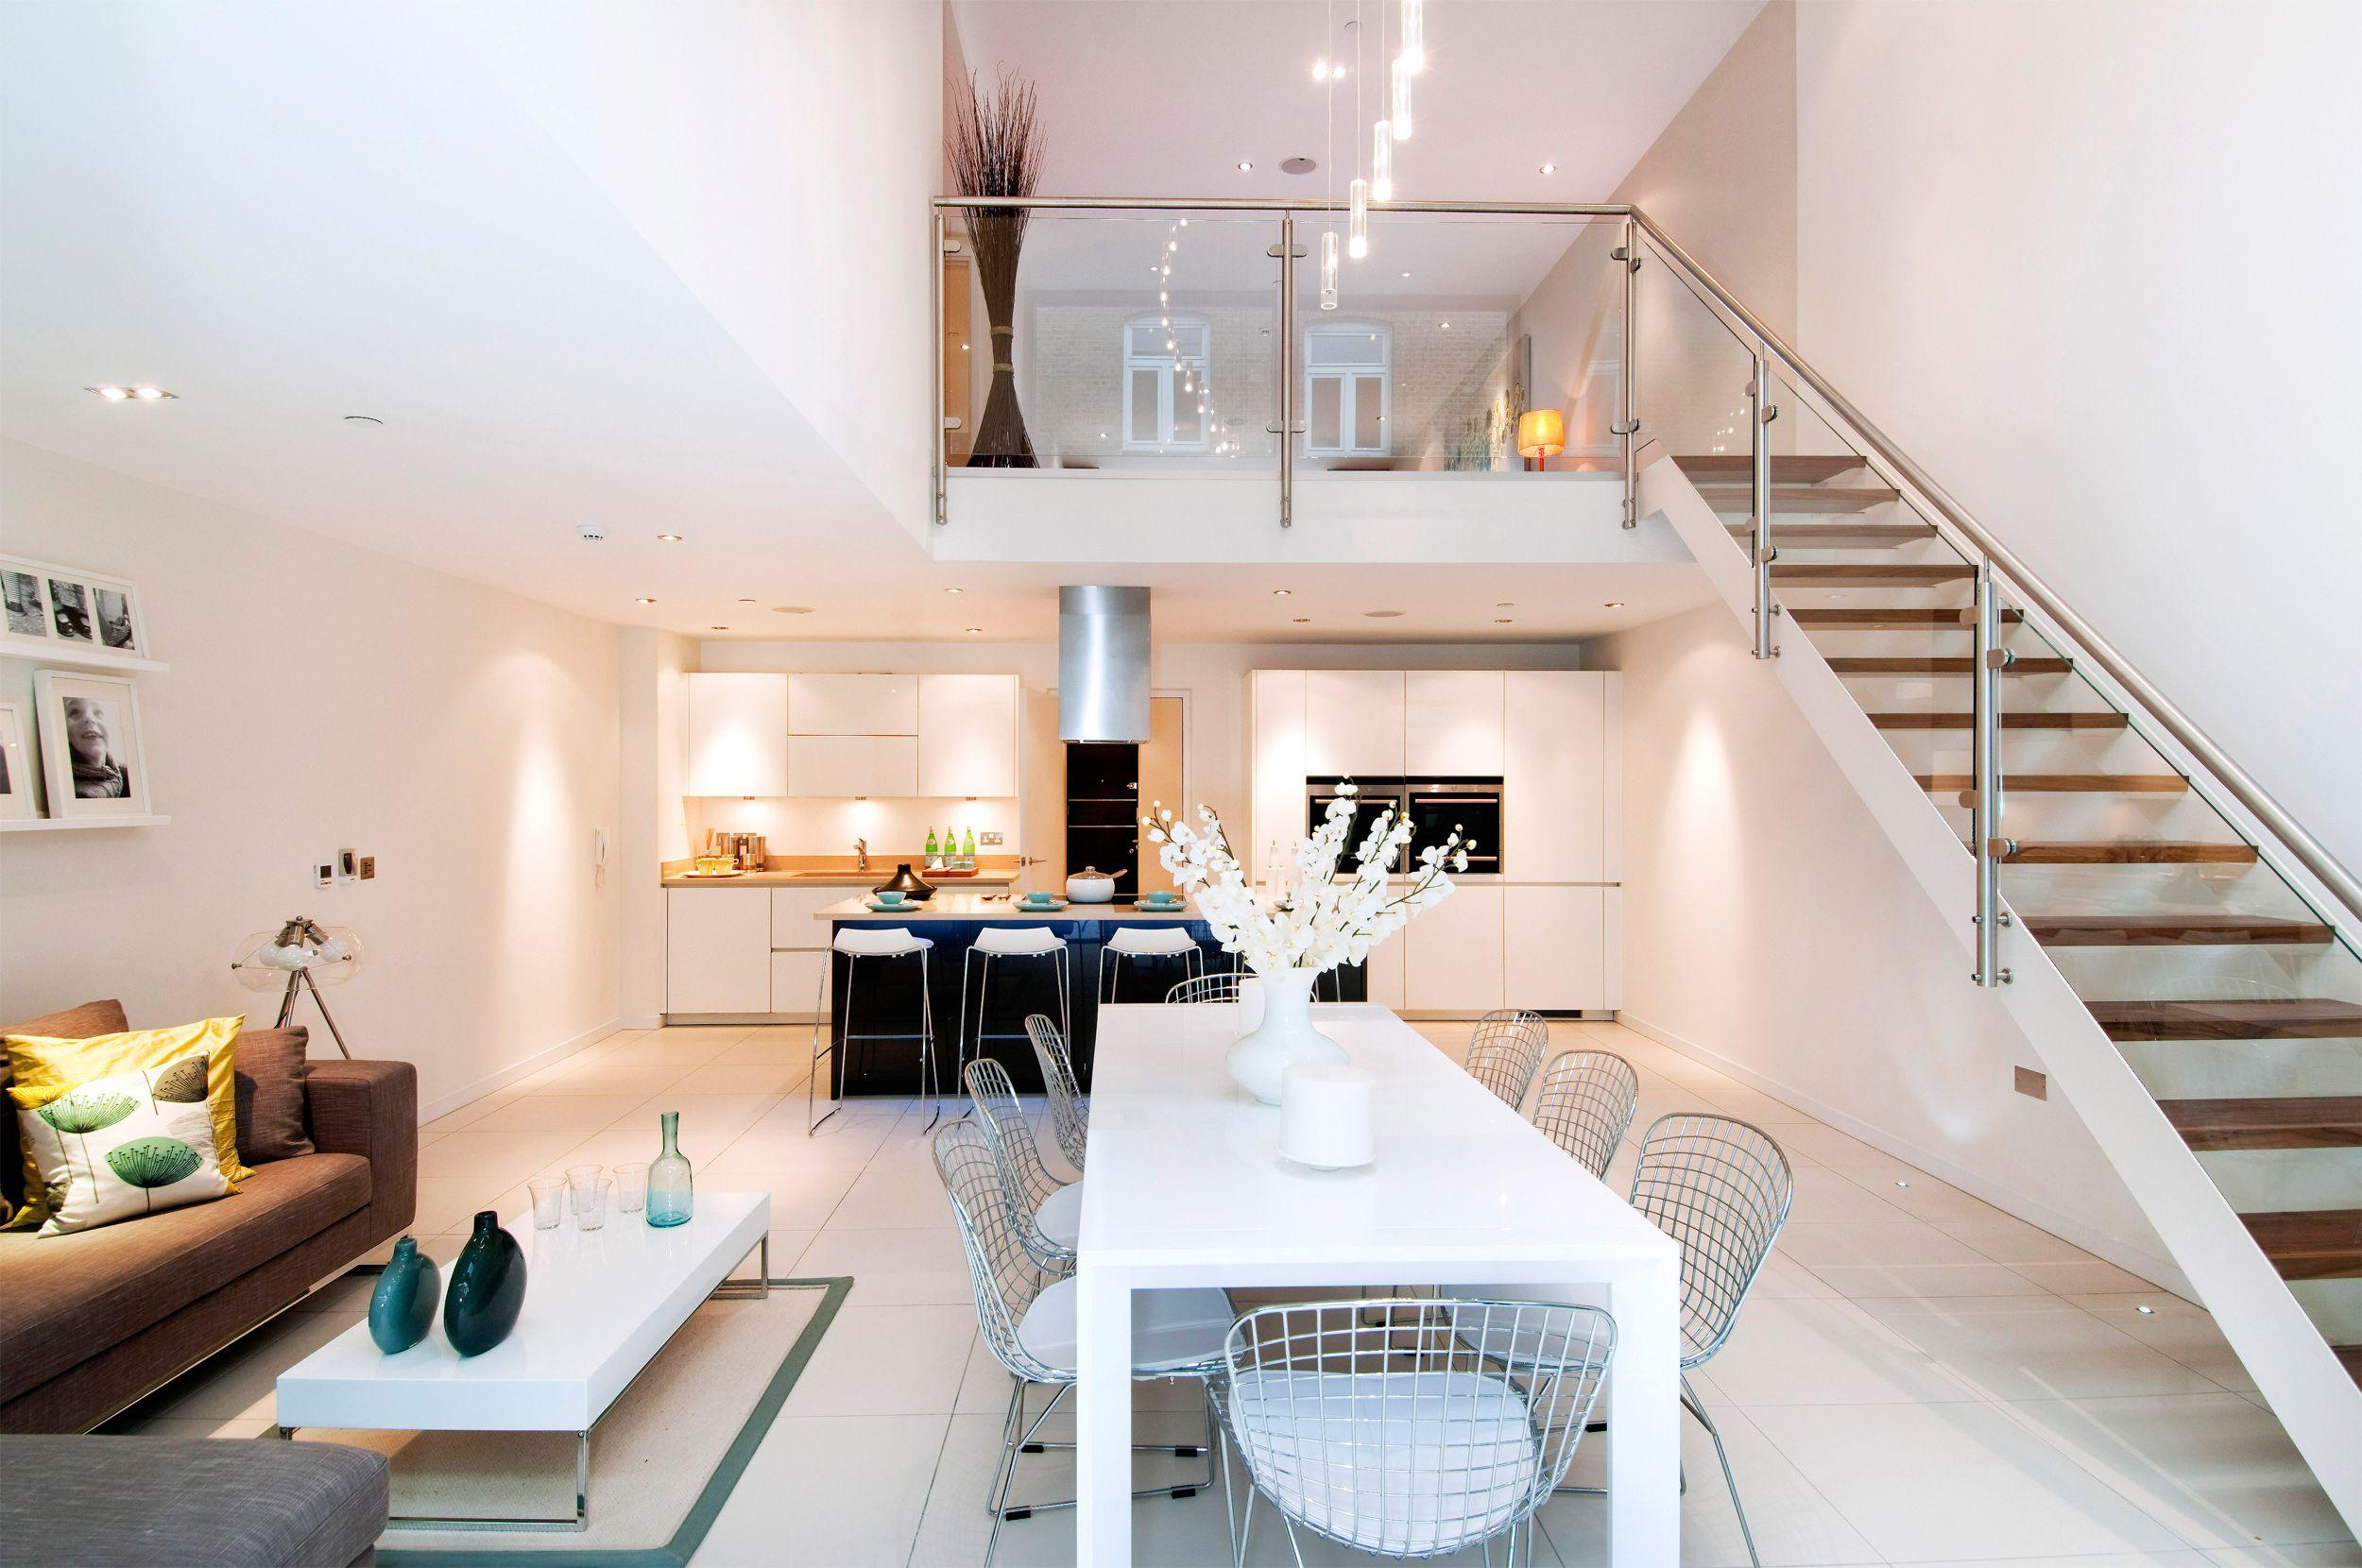 Houses Interior Design 20 Clever Design Ideas Home Simple House